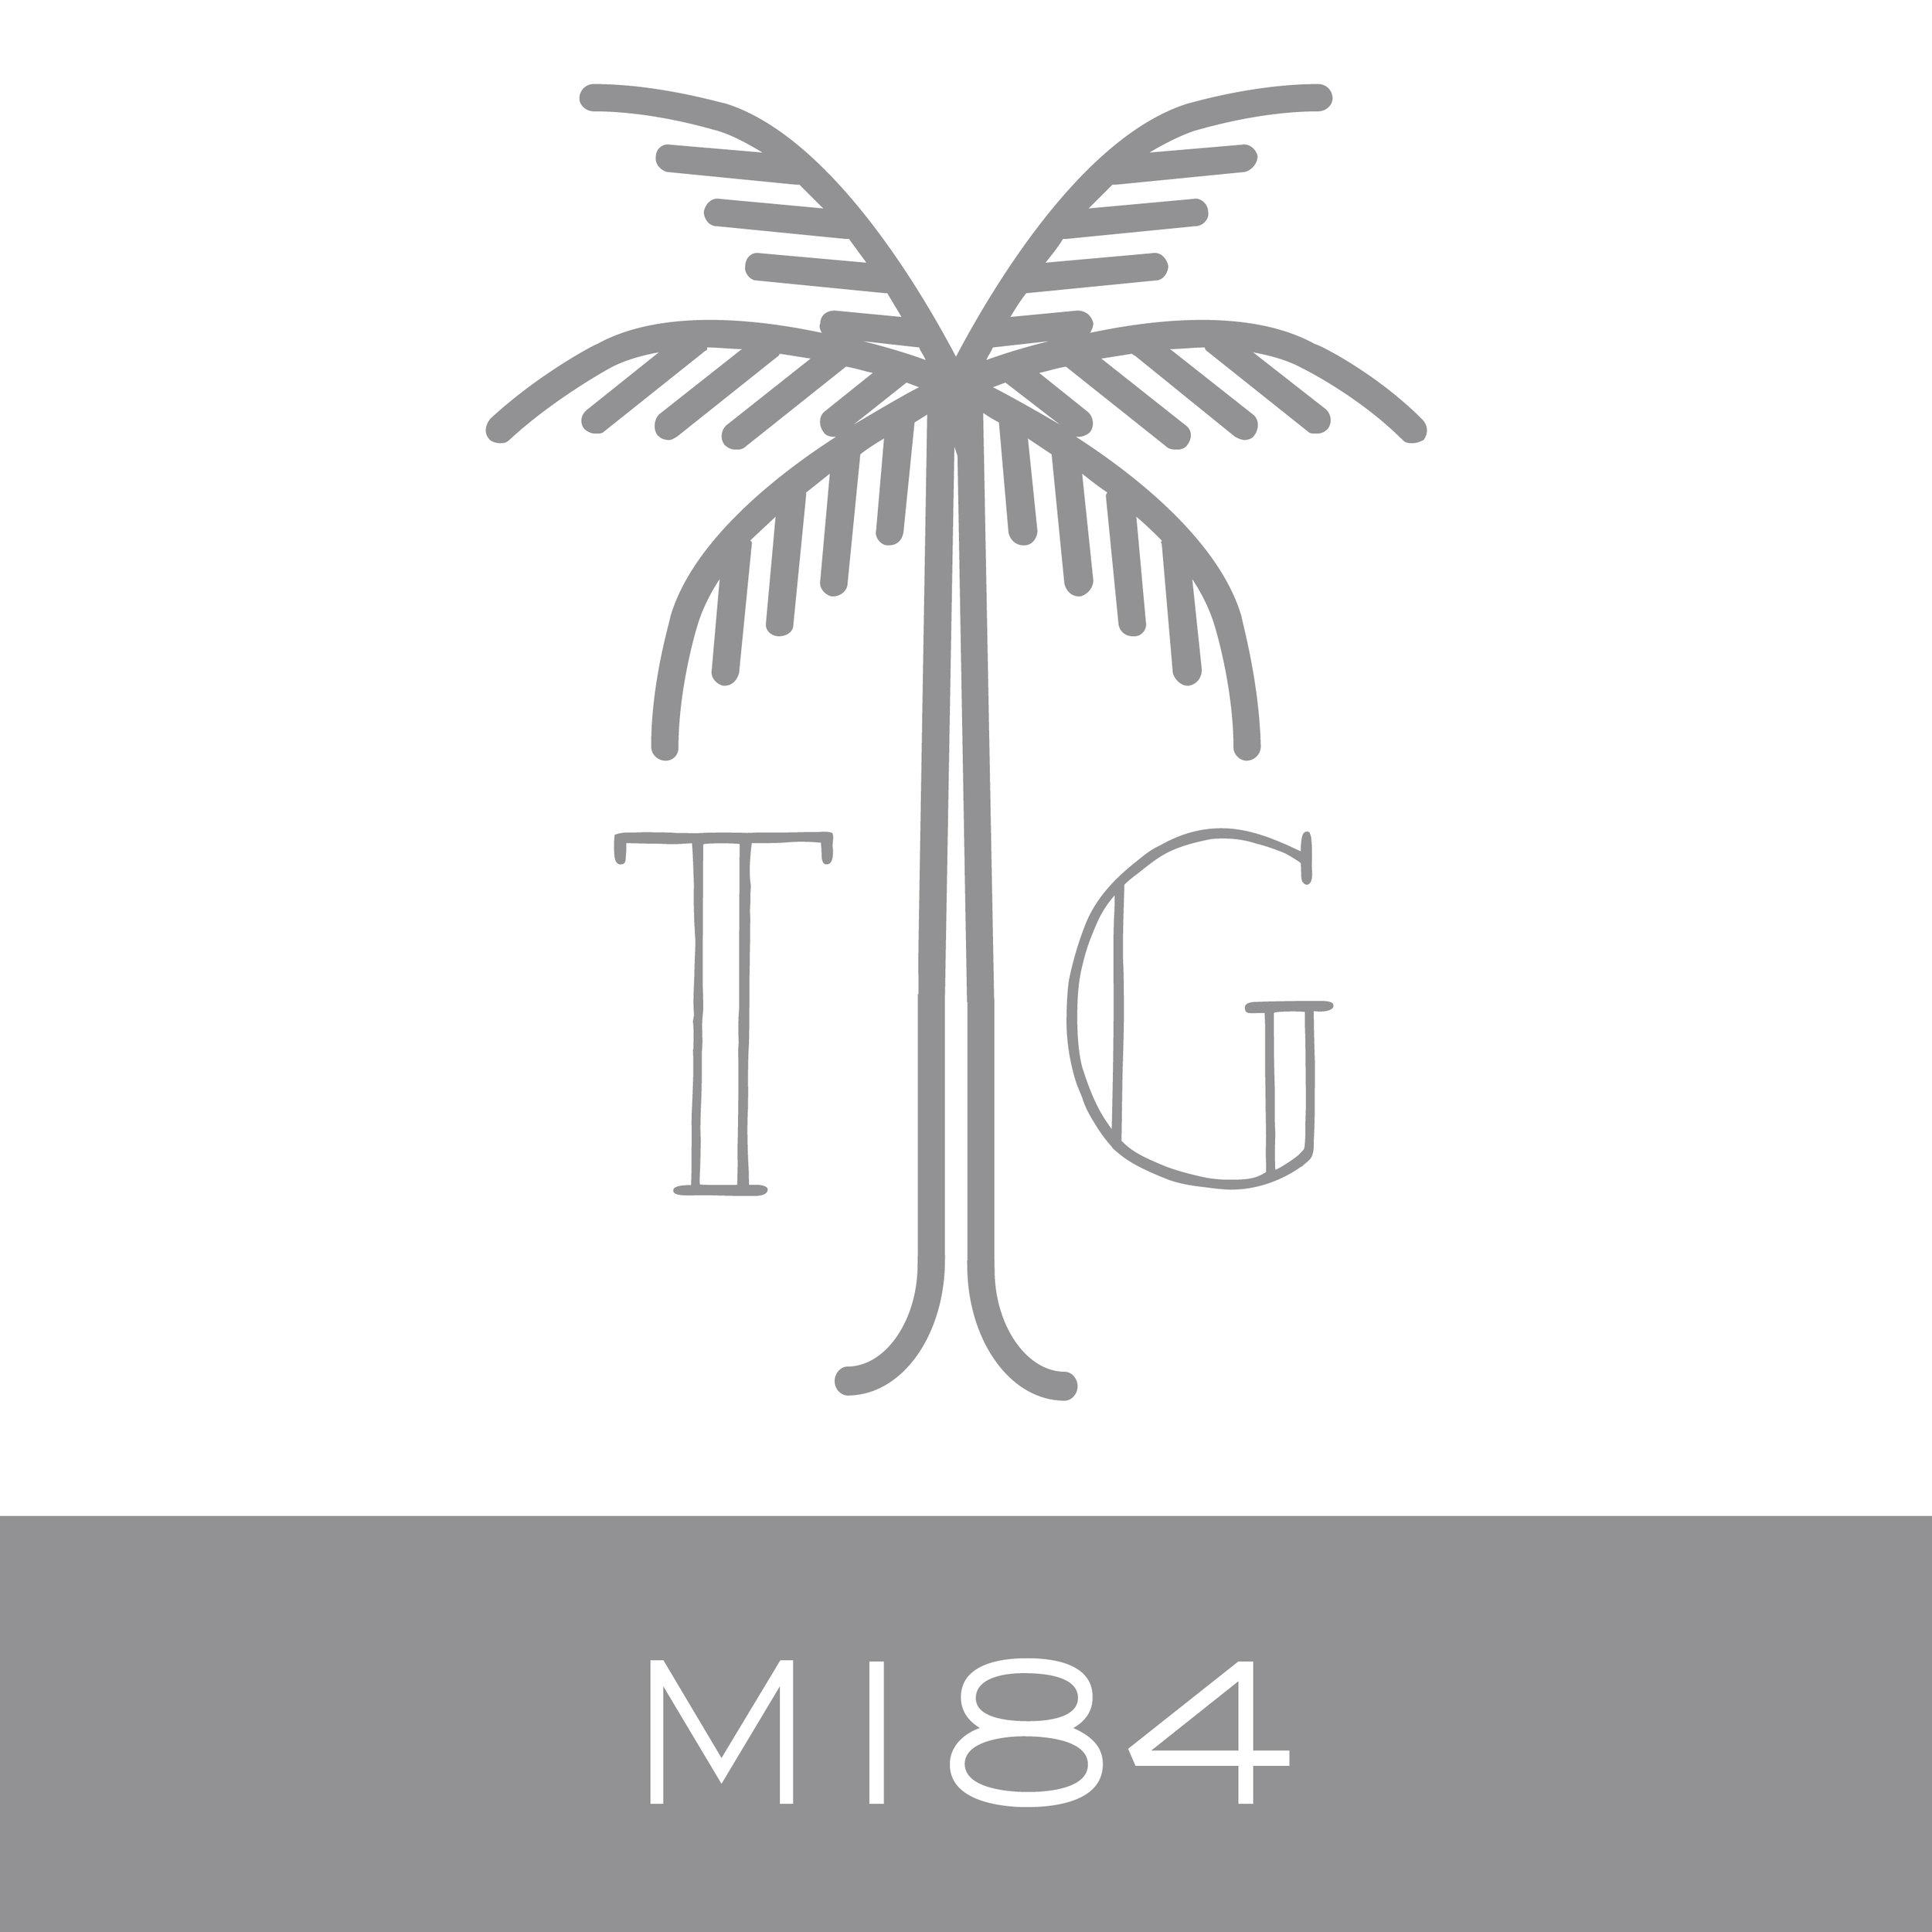 M184.jpg